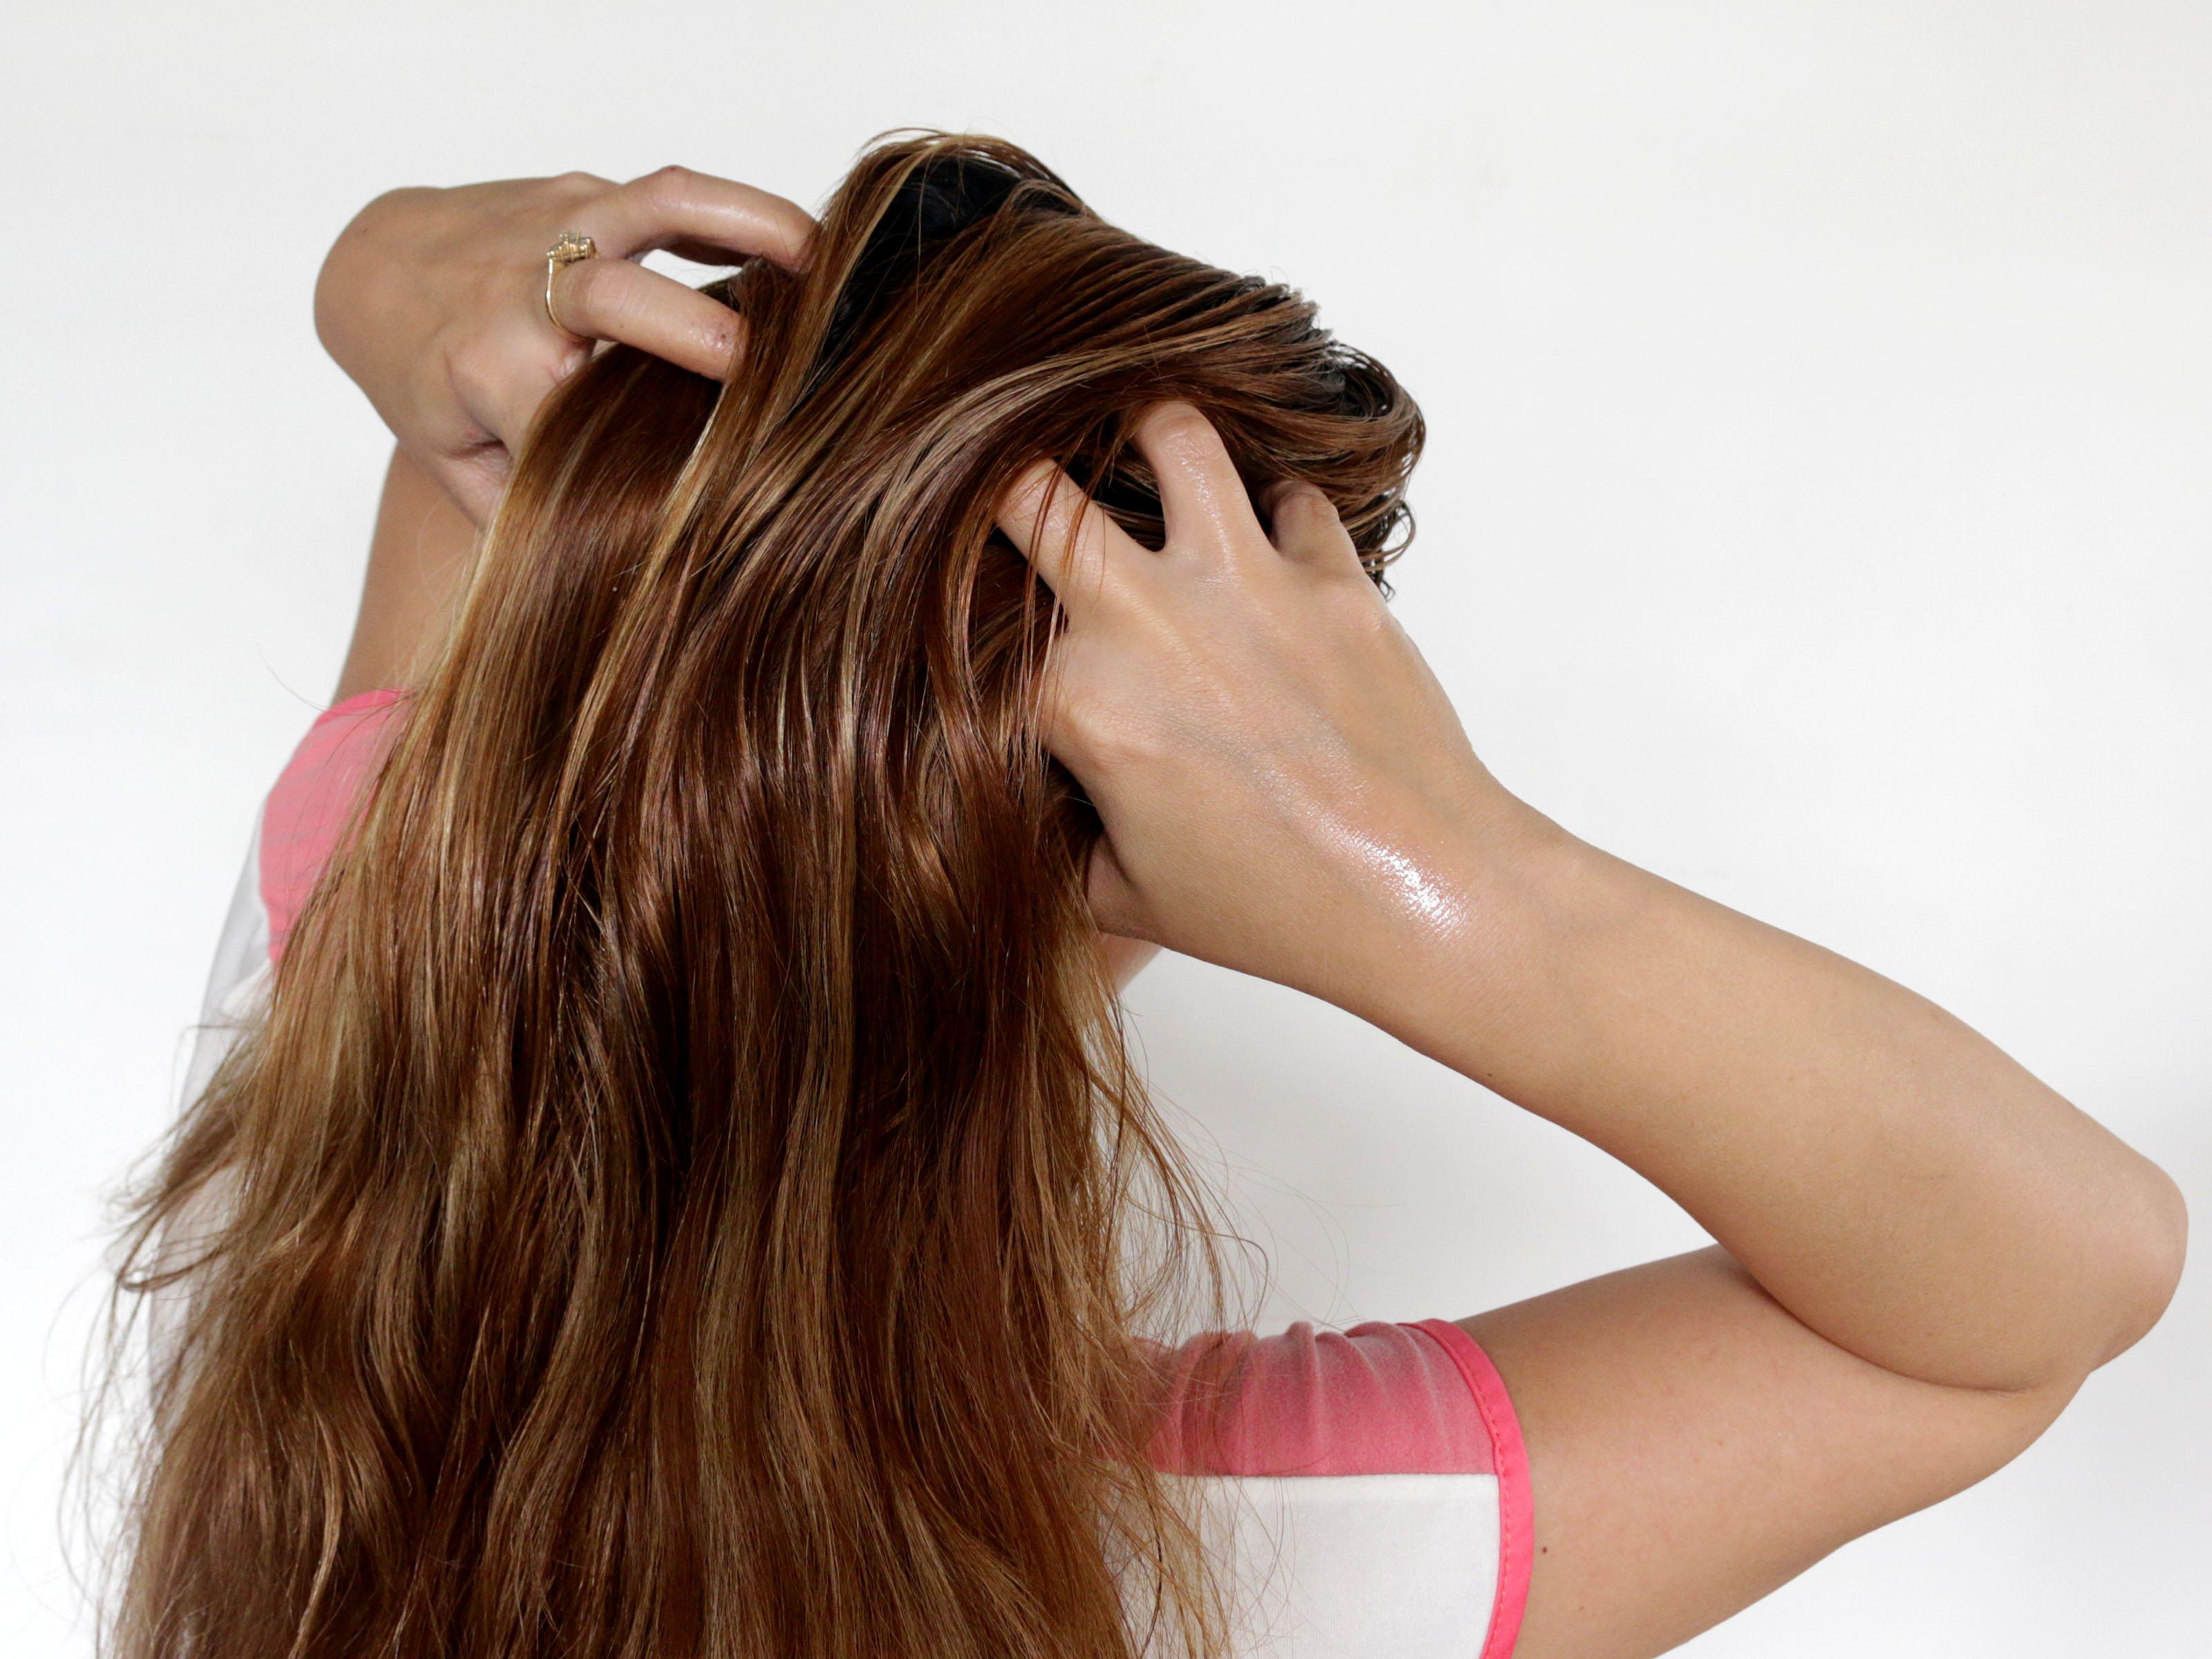 hair oil massage에 대한 이미지 검색결과